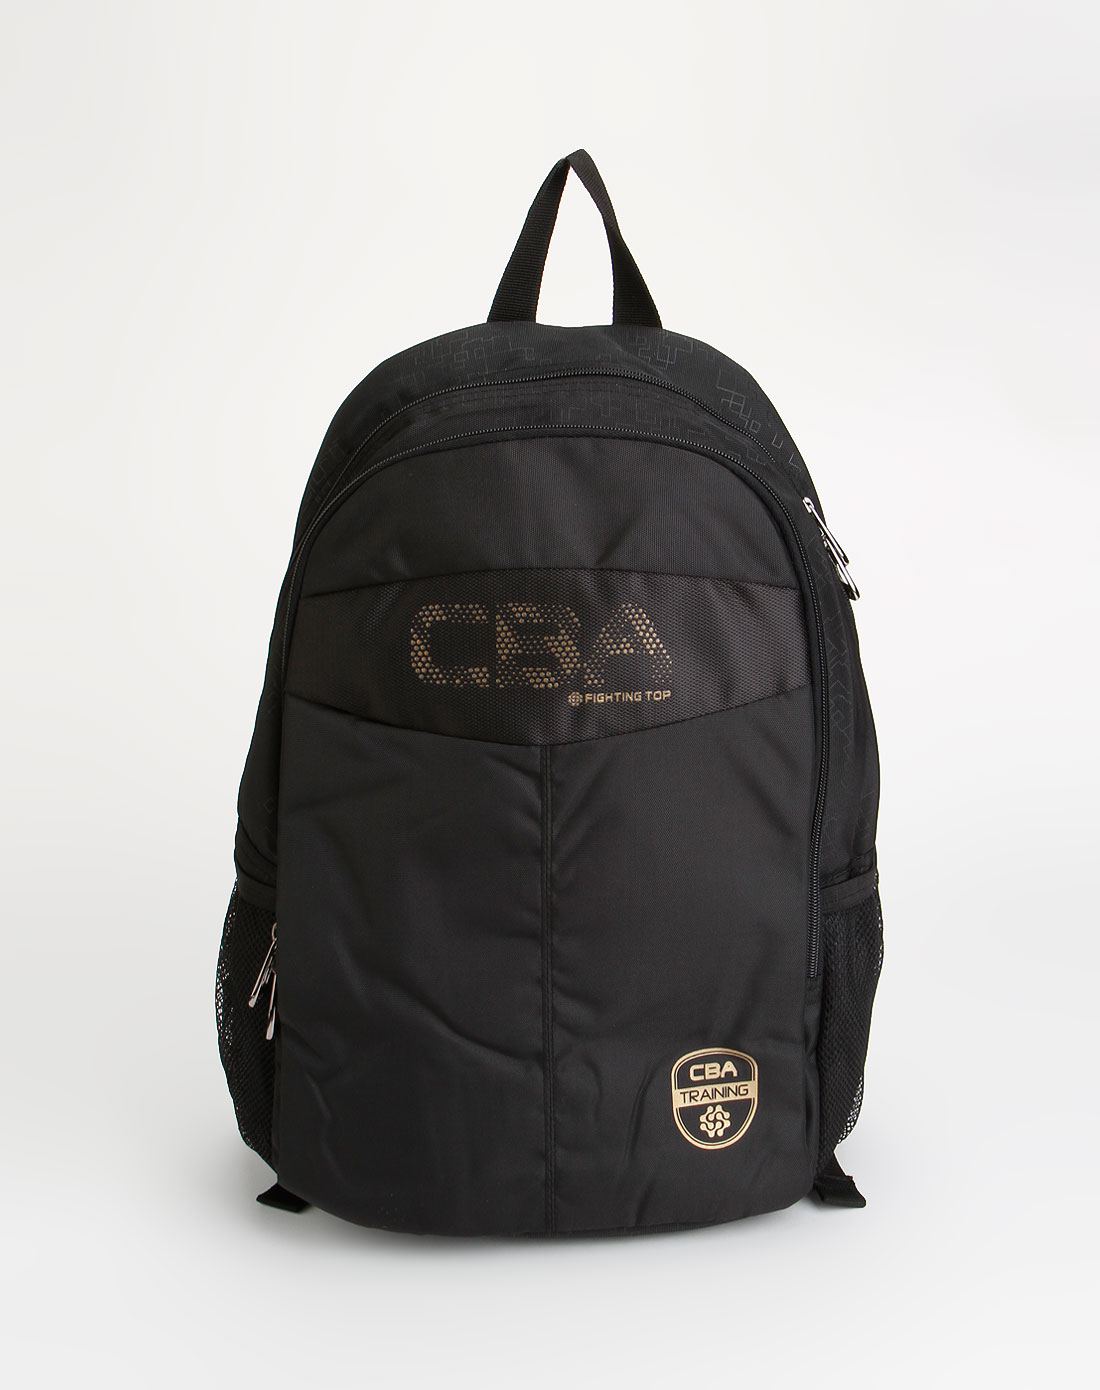 cba男女装黑色休闲双肩背包2